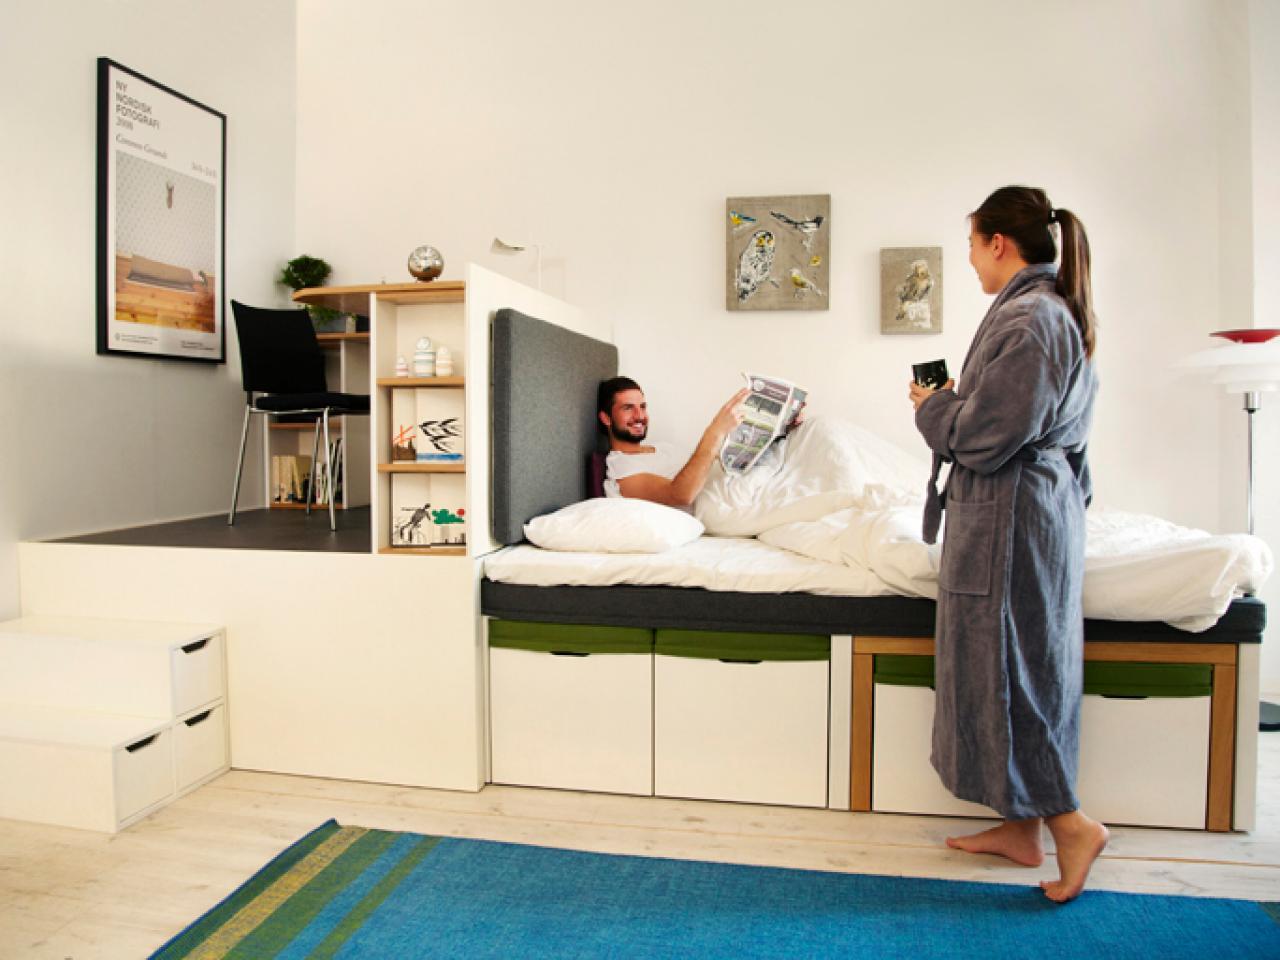 10 Things to Get Rid of Now   HGTV\'s Decorating & Design Blog   HGTV